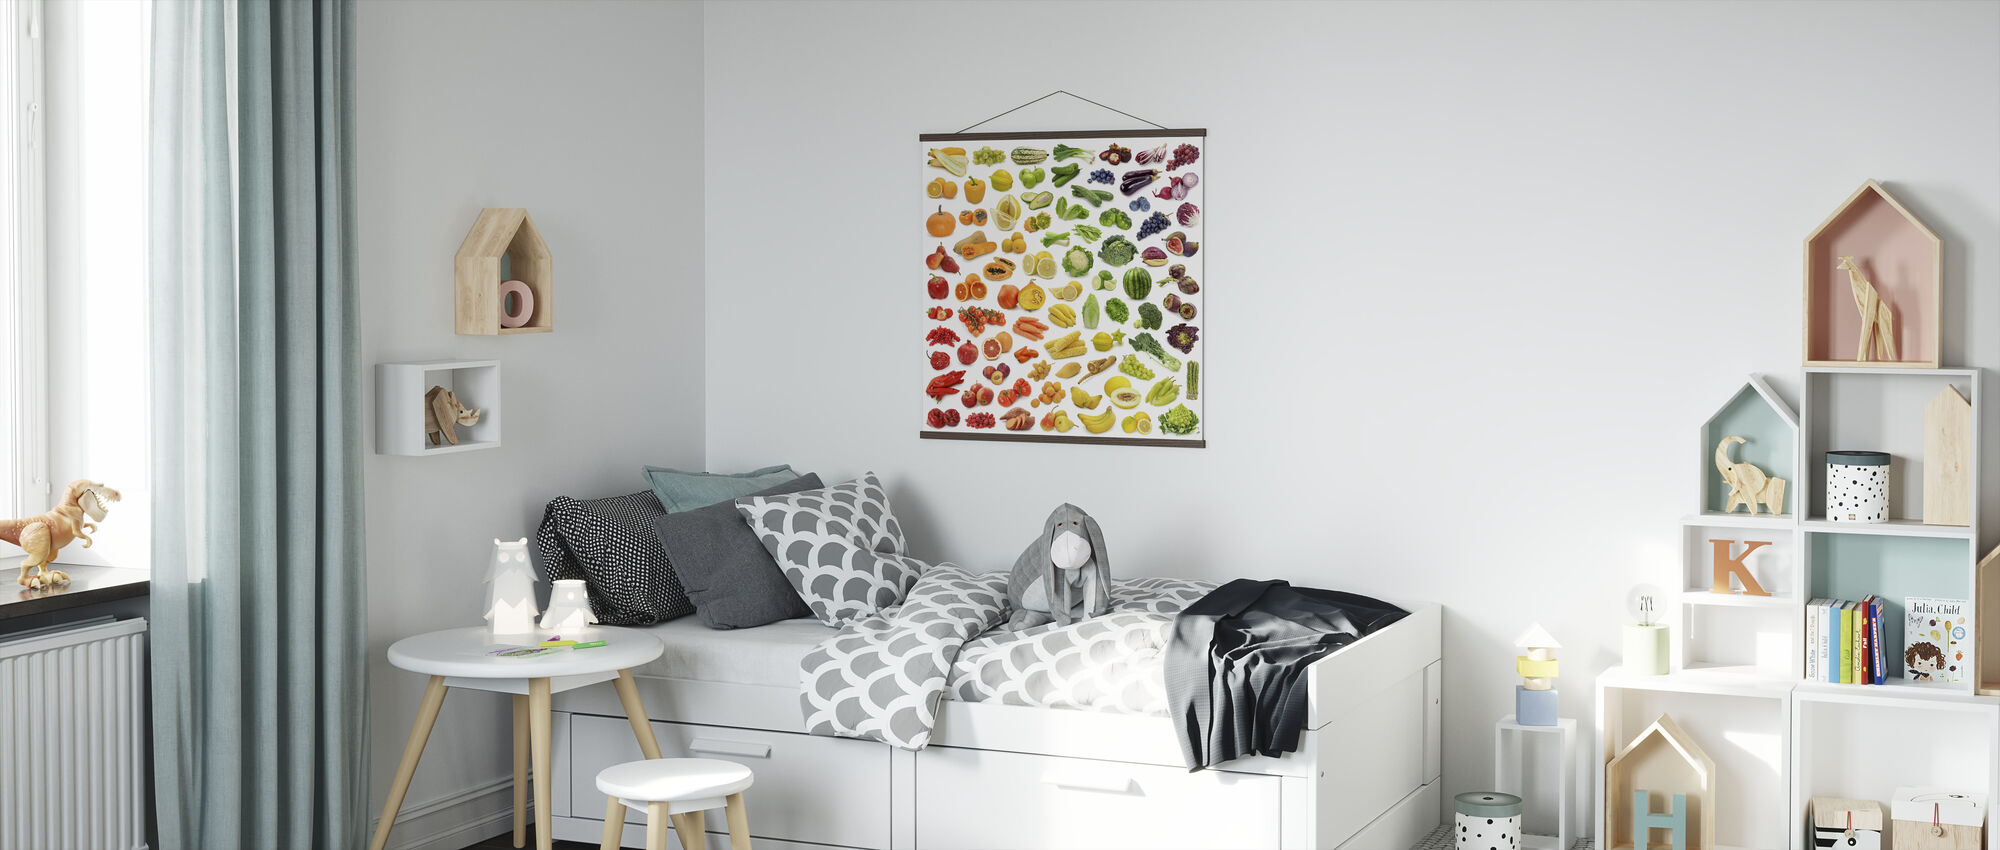 Juicy Fruits - Poster - Kids Room